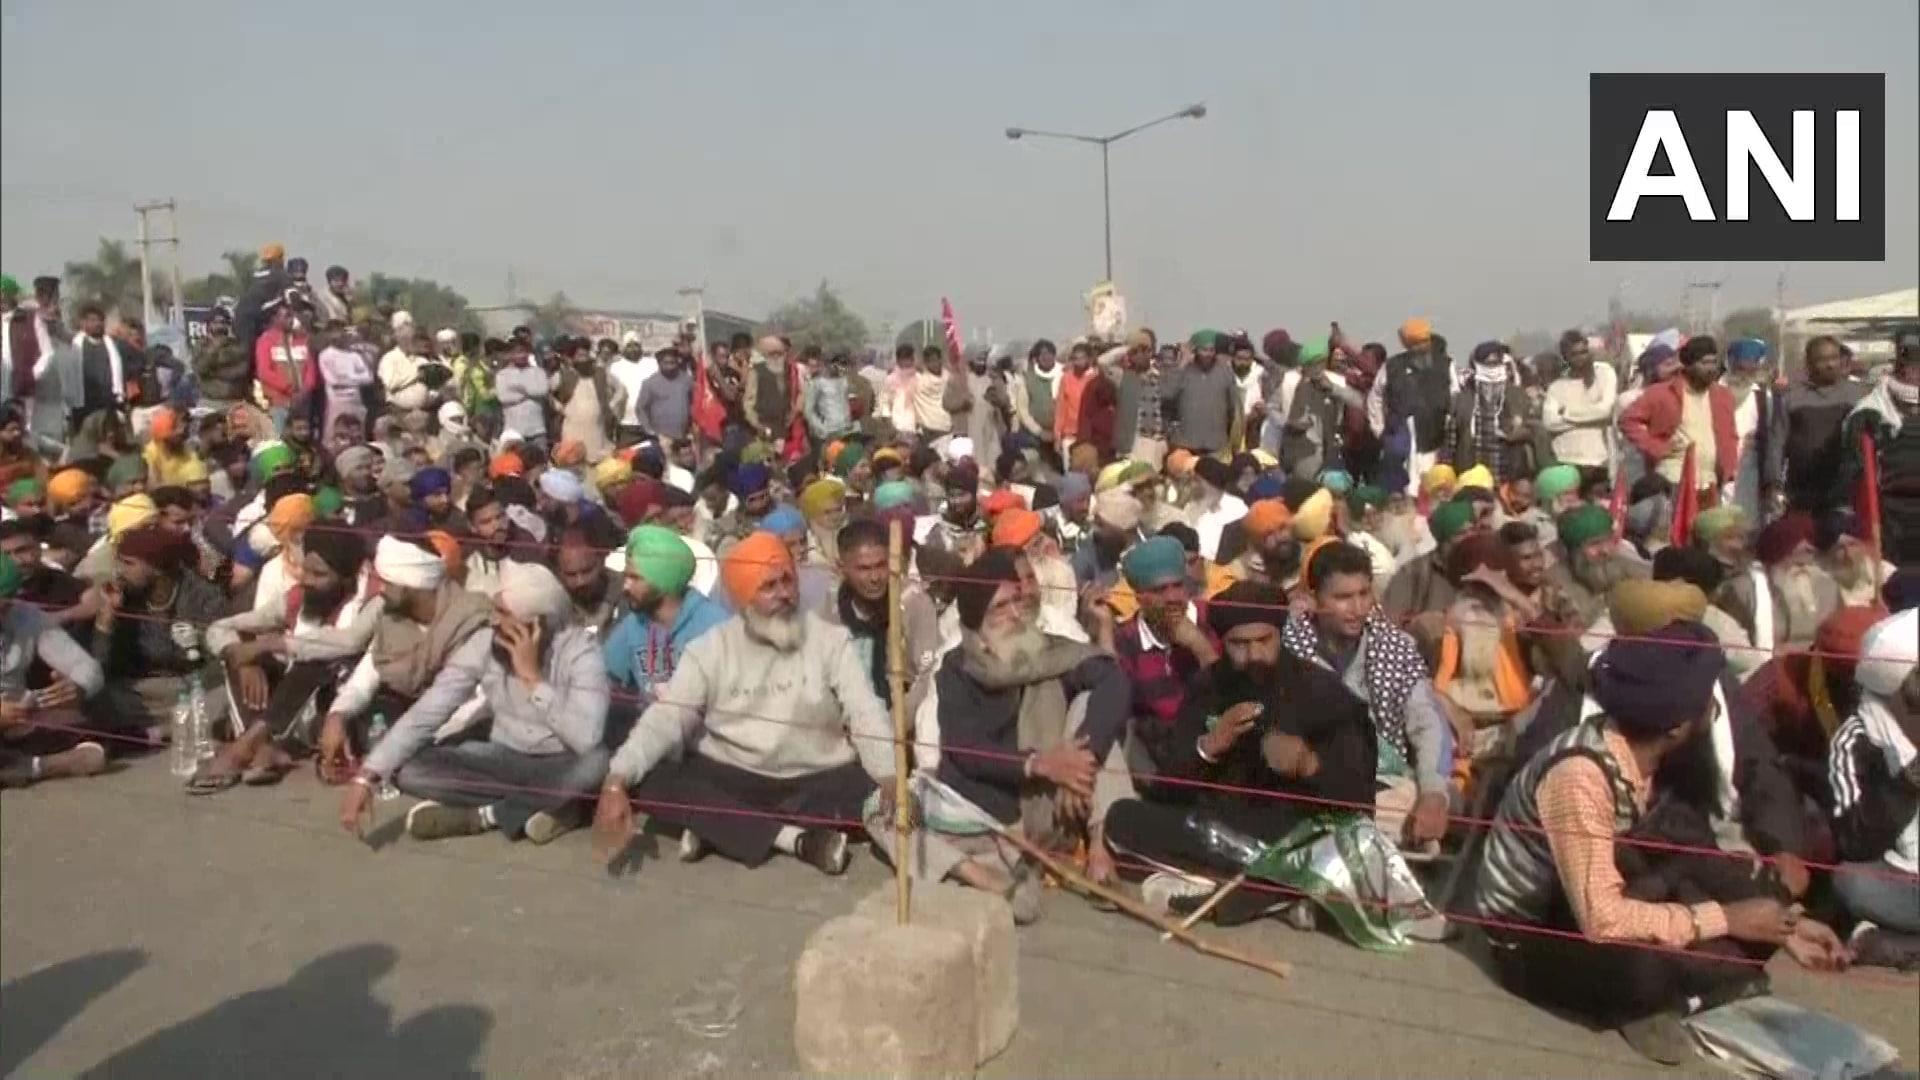 <p>Farmers continue their protest at Singhu border</p>